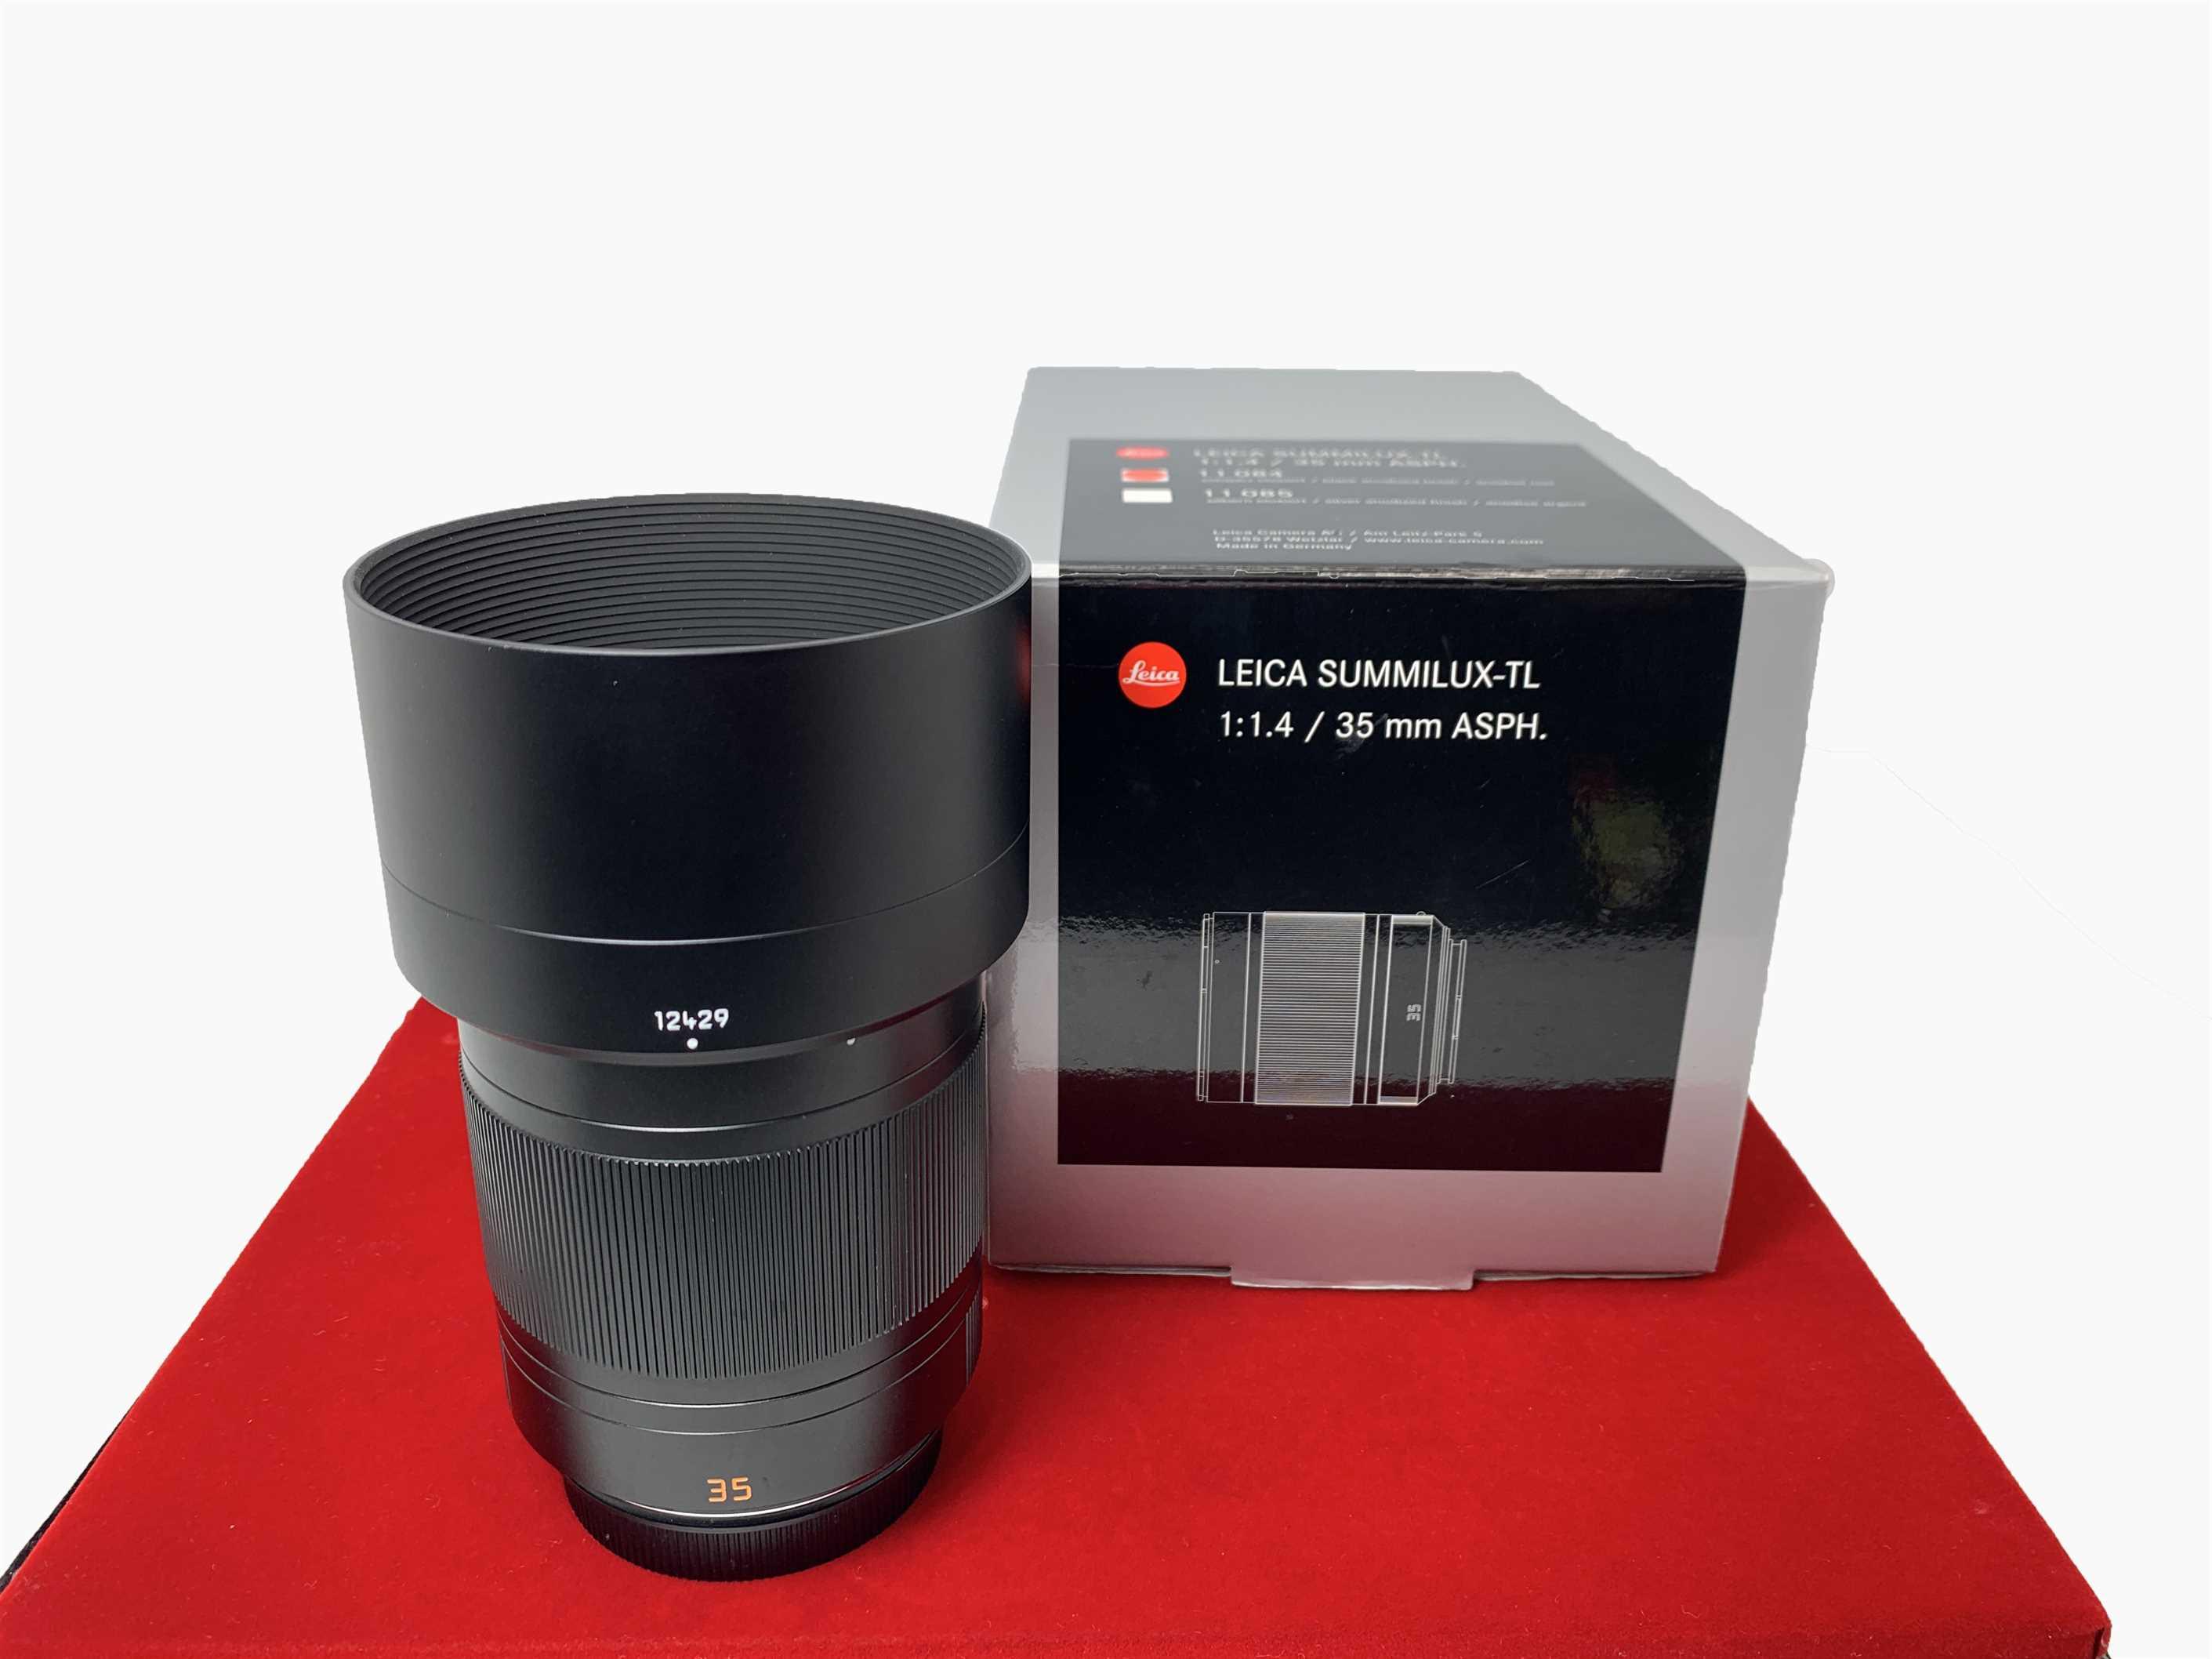 [USED-PJ33] Leica 35MM F1.4 Summilux-TL, 95% Like New Condition (S/N:4590793)